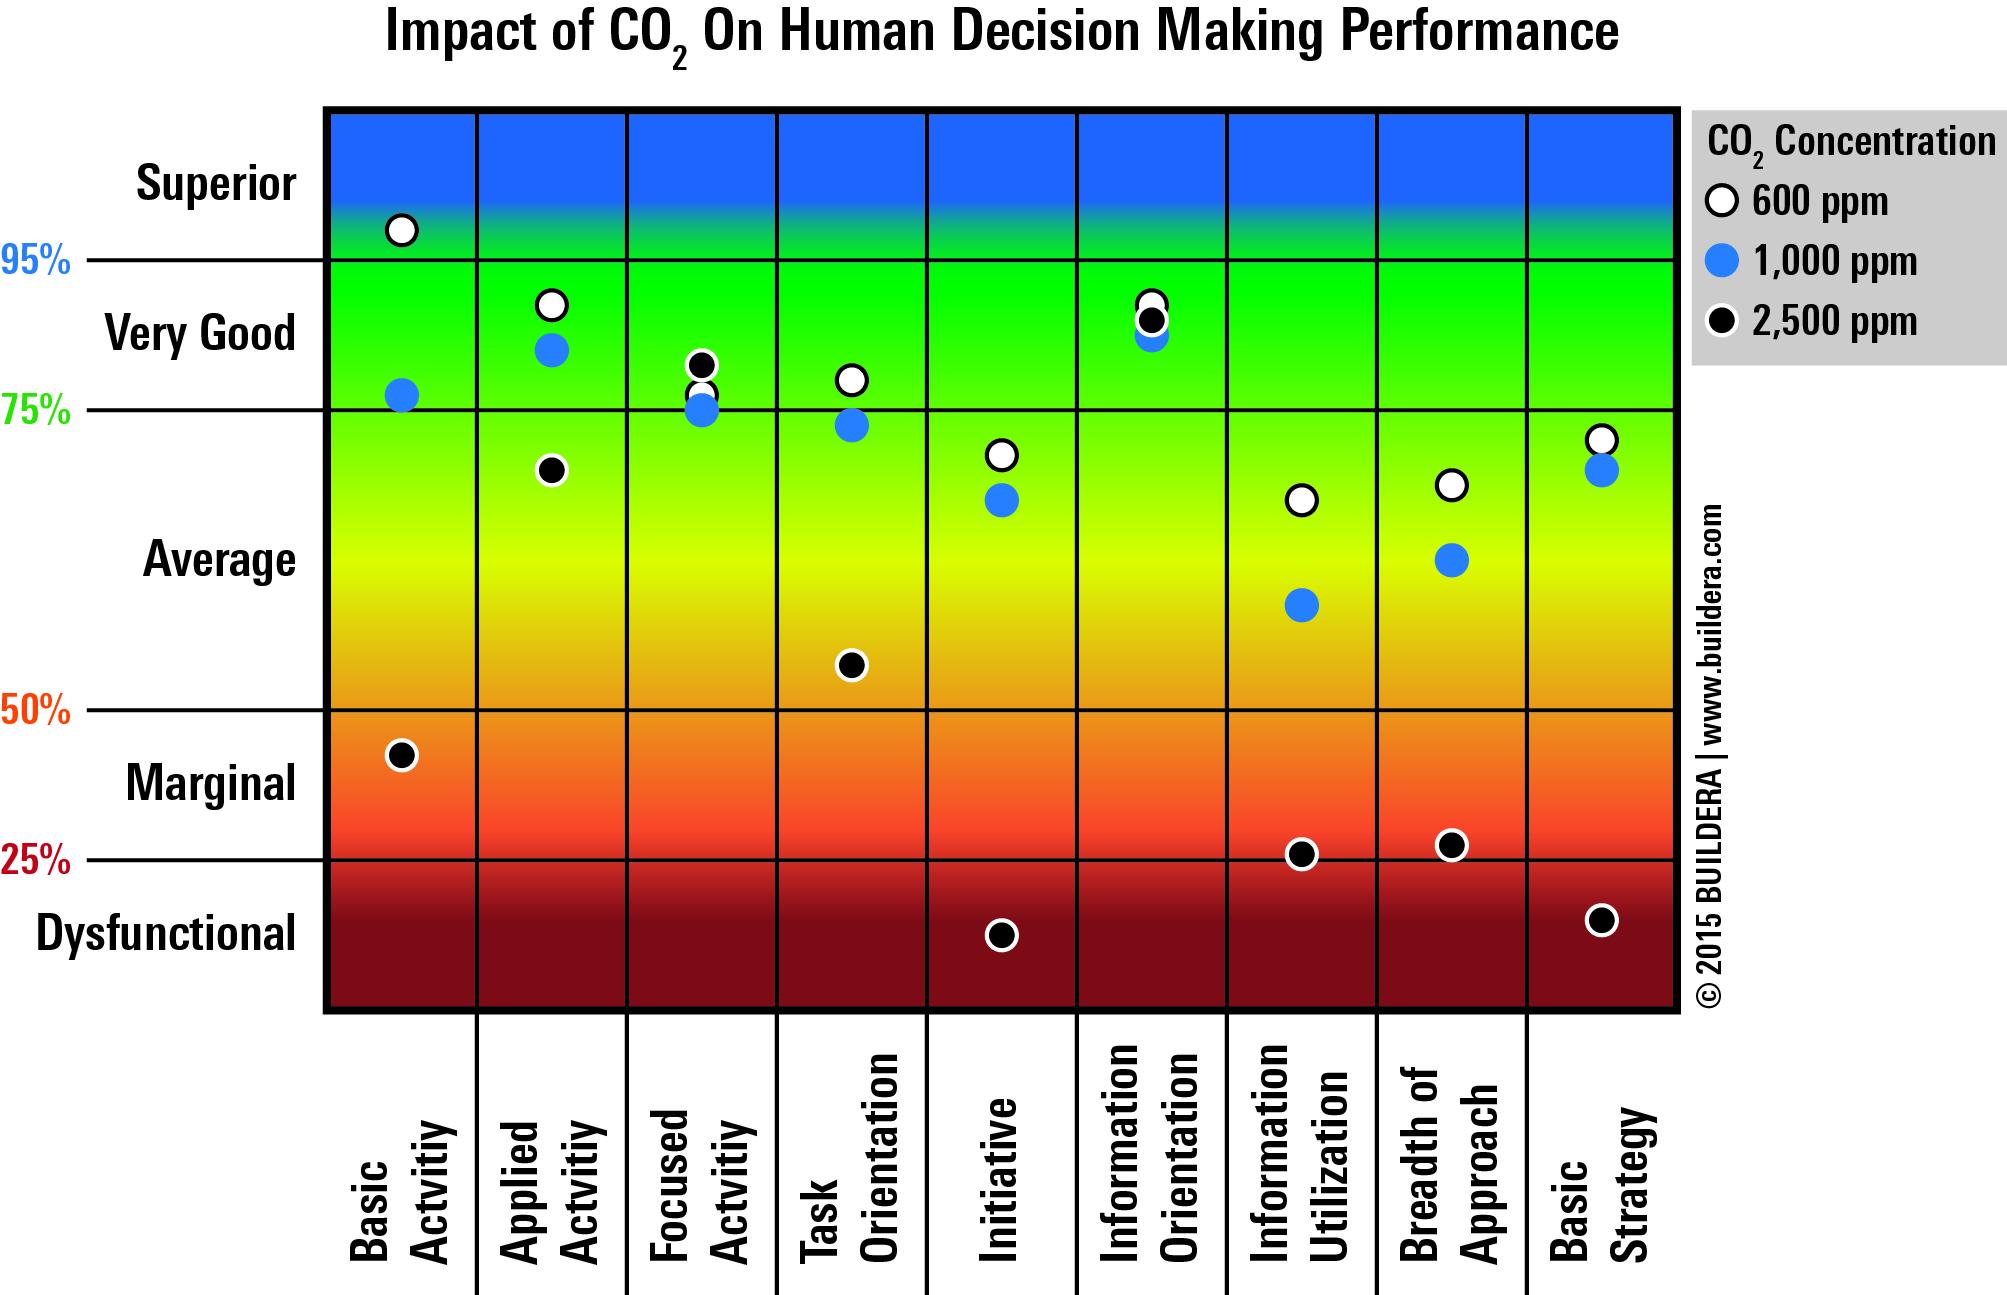 buildera-co2-human-decision-performance.jpg